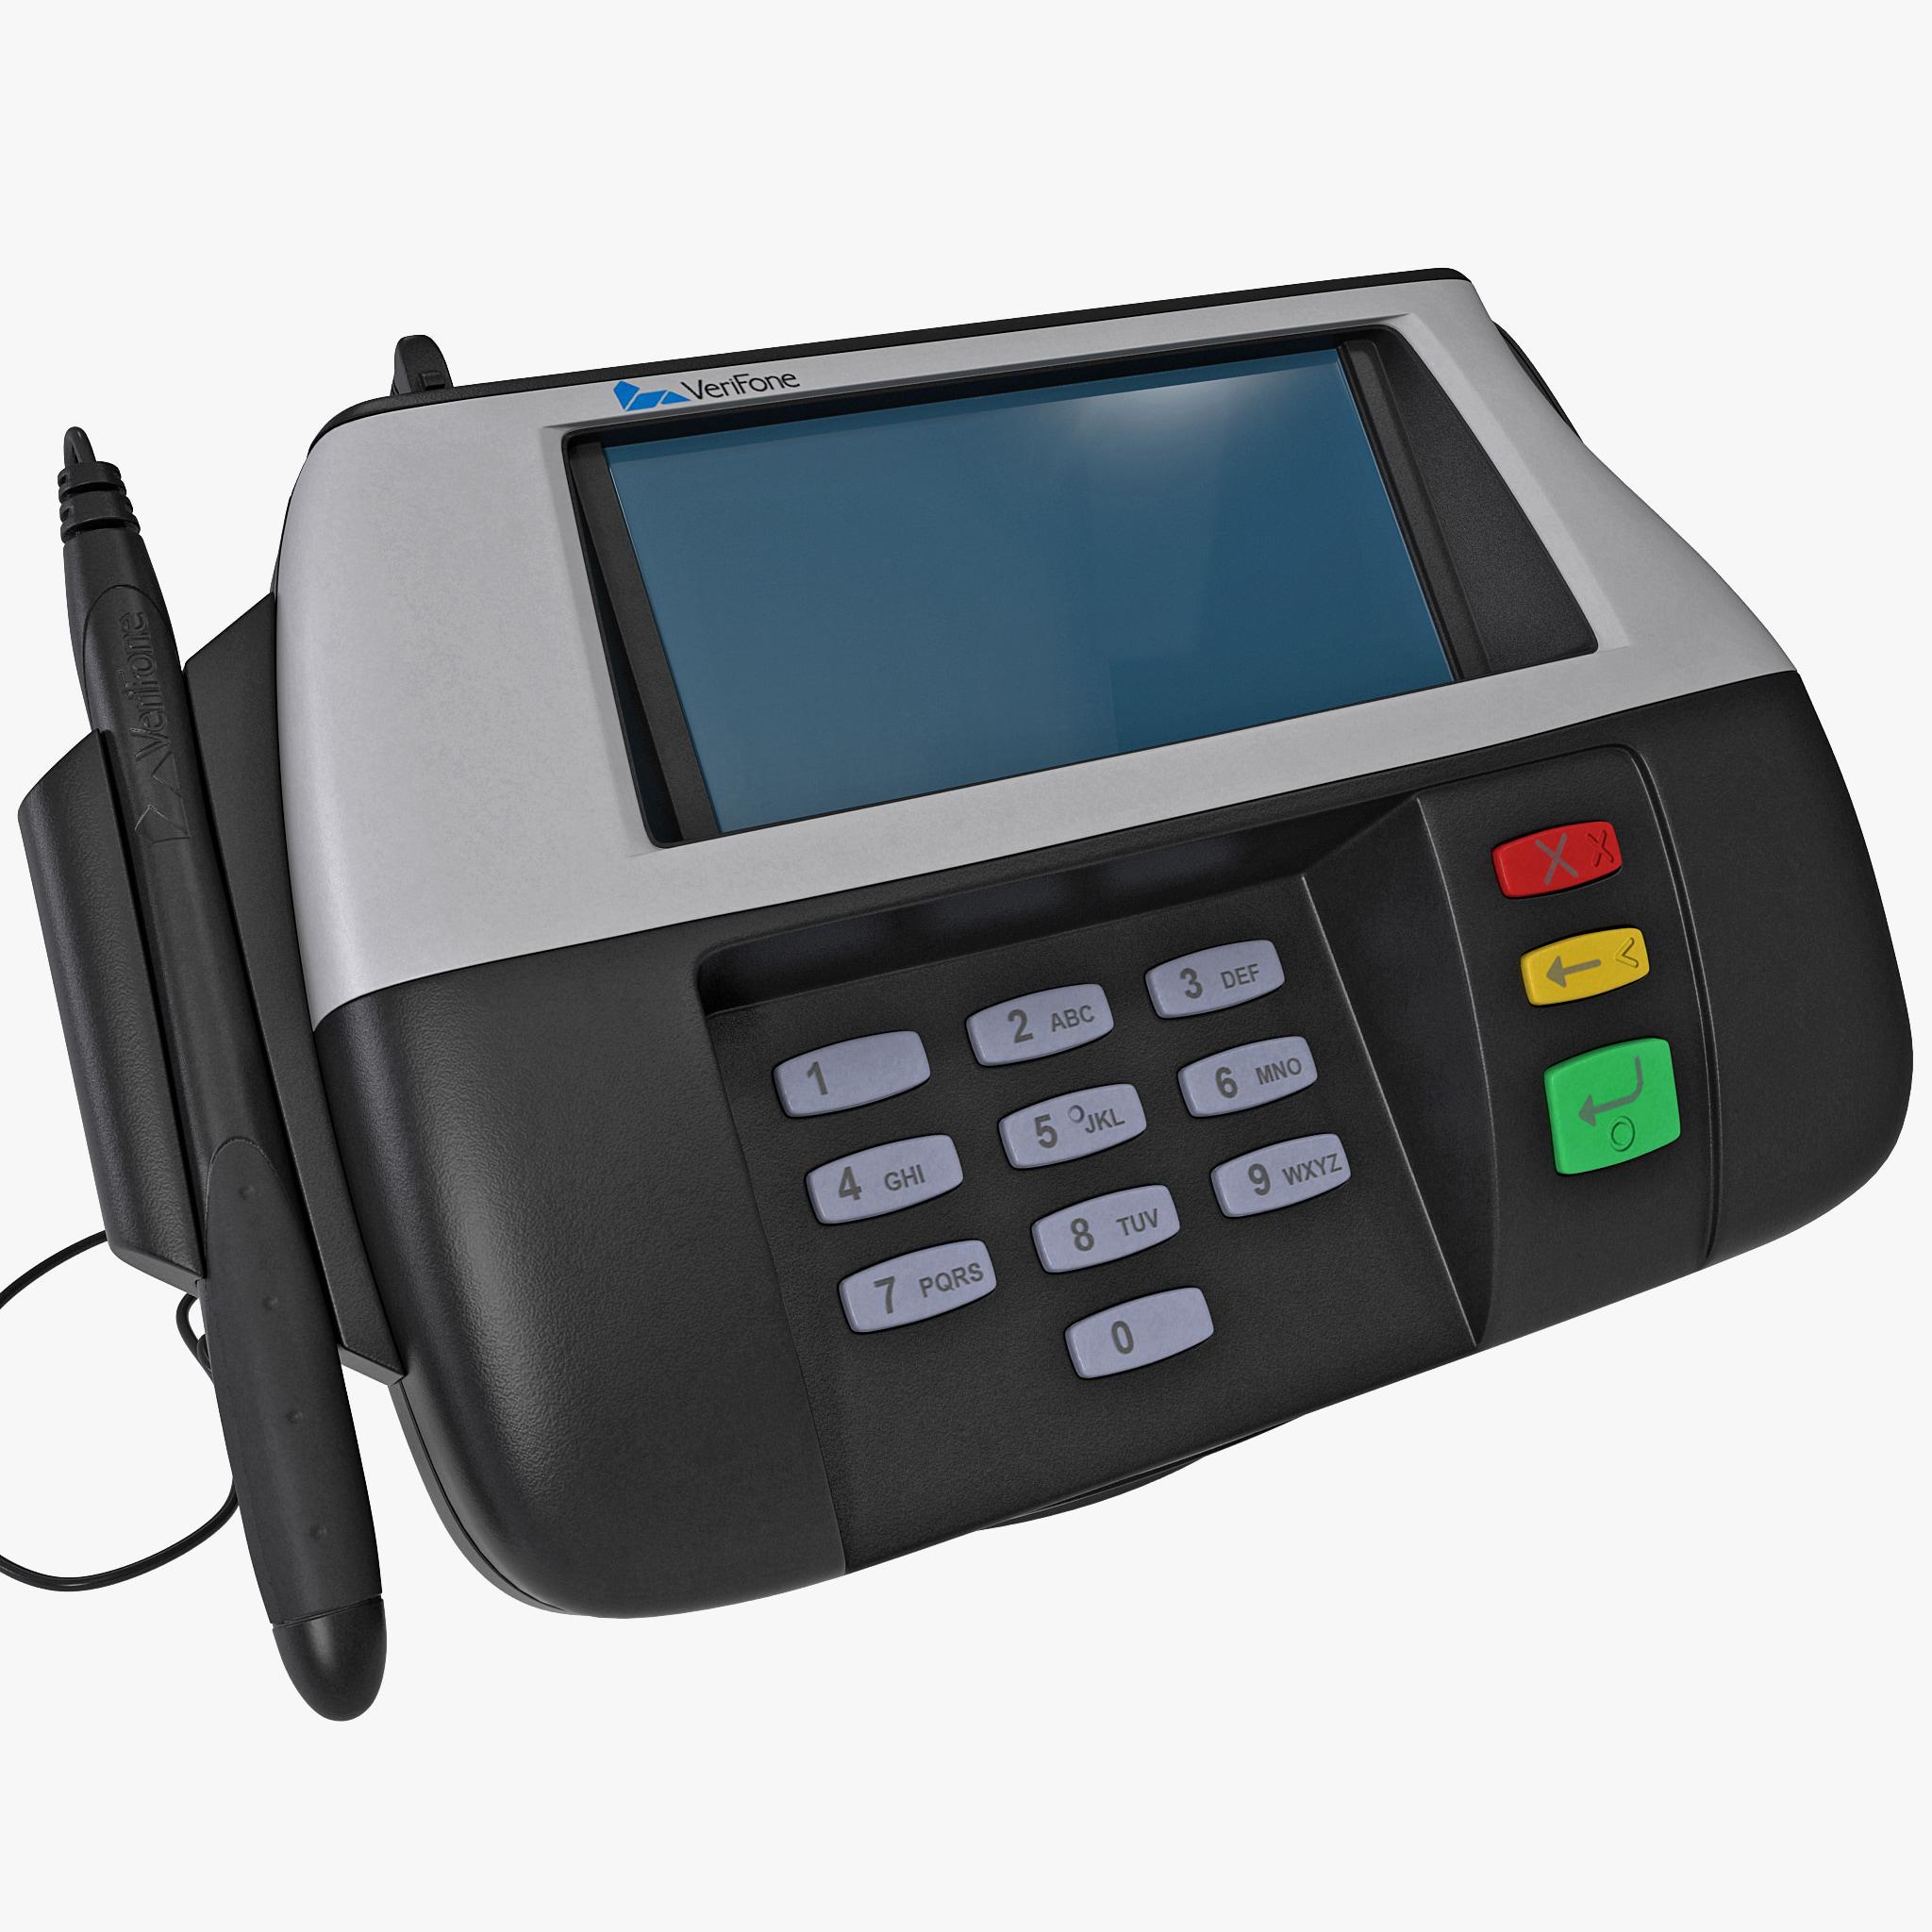 Credit Card Terminal Verifone_168.jpg